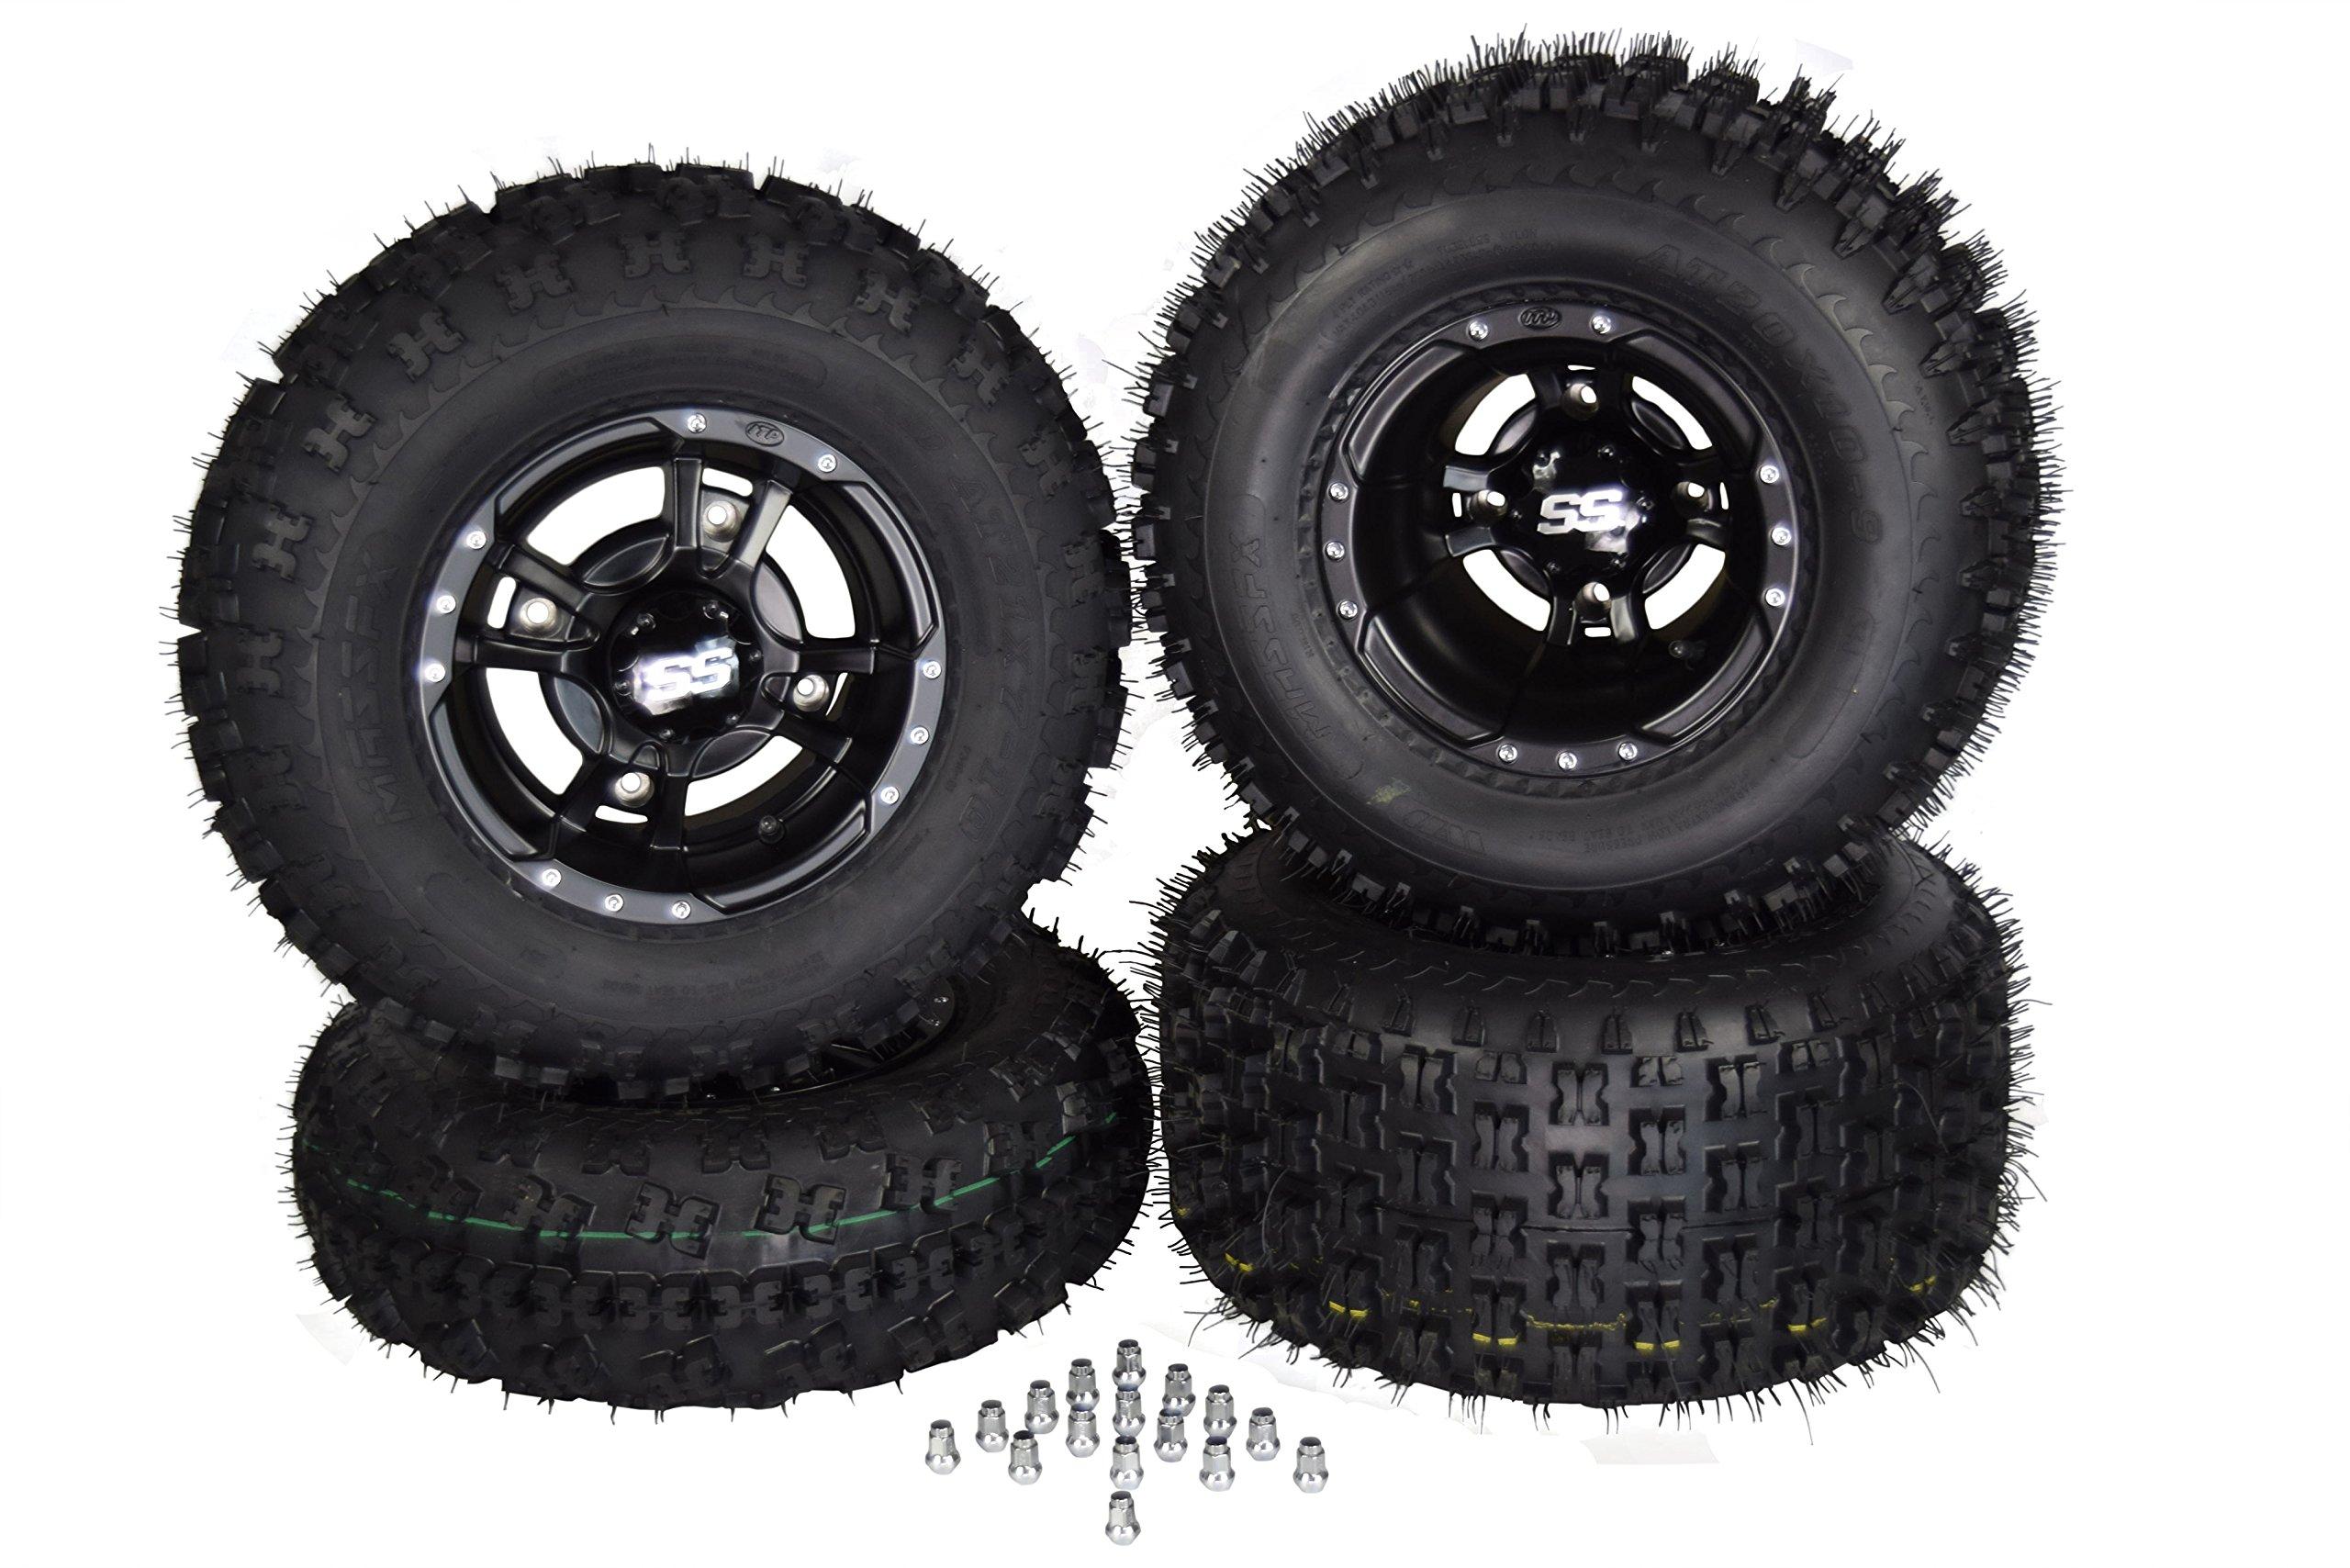 SET 4 YAMAHA RAPTOR 660R 700 Black ITP SS112 Rims & MASSFX Tires Wheels kit